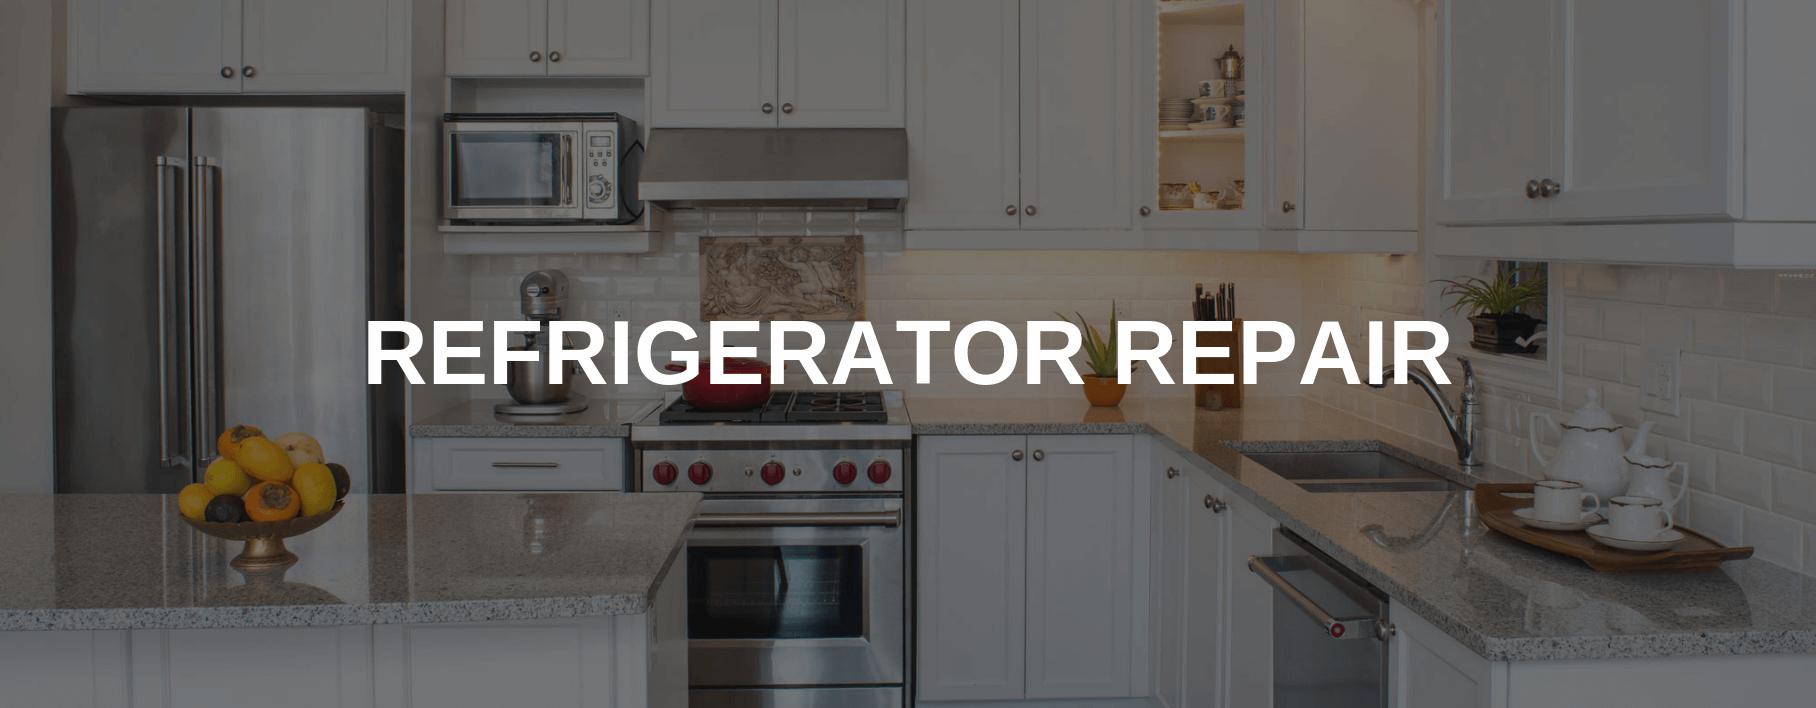 refrigerator repair garden grove